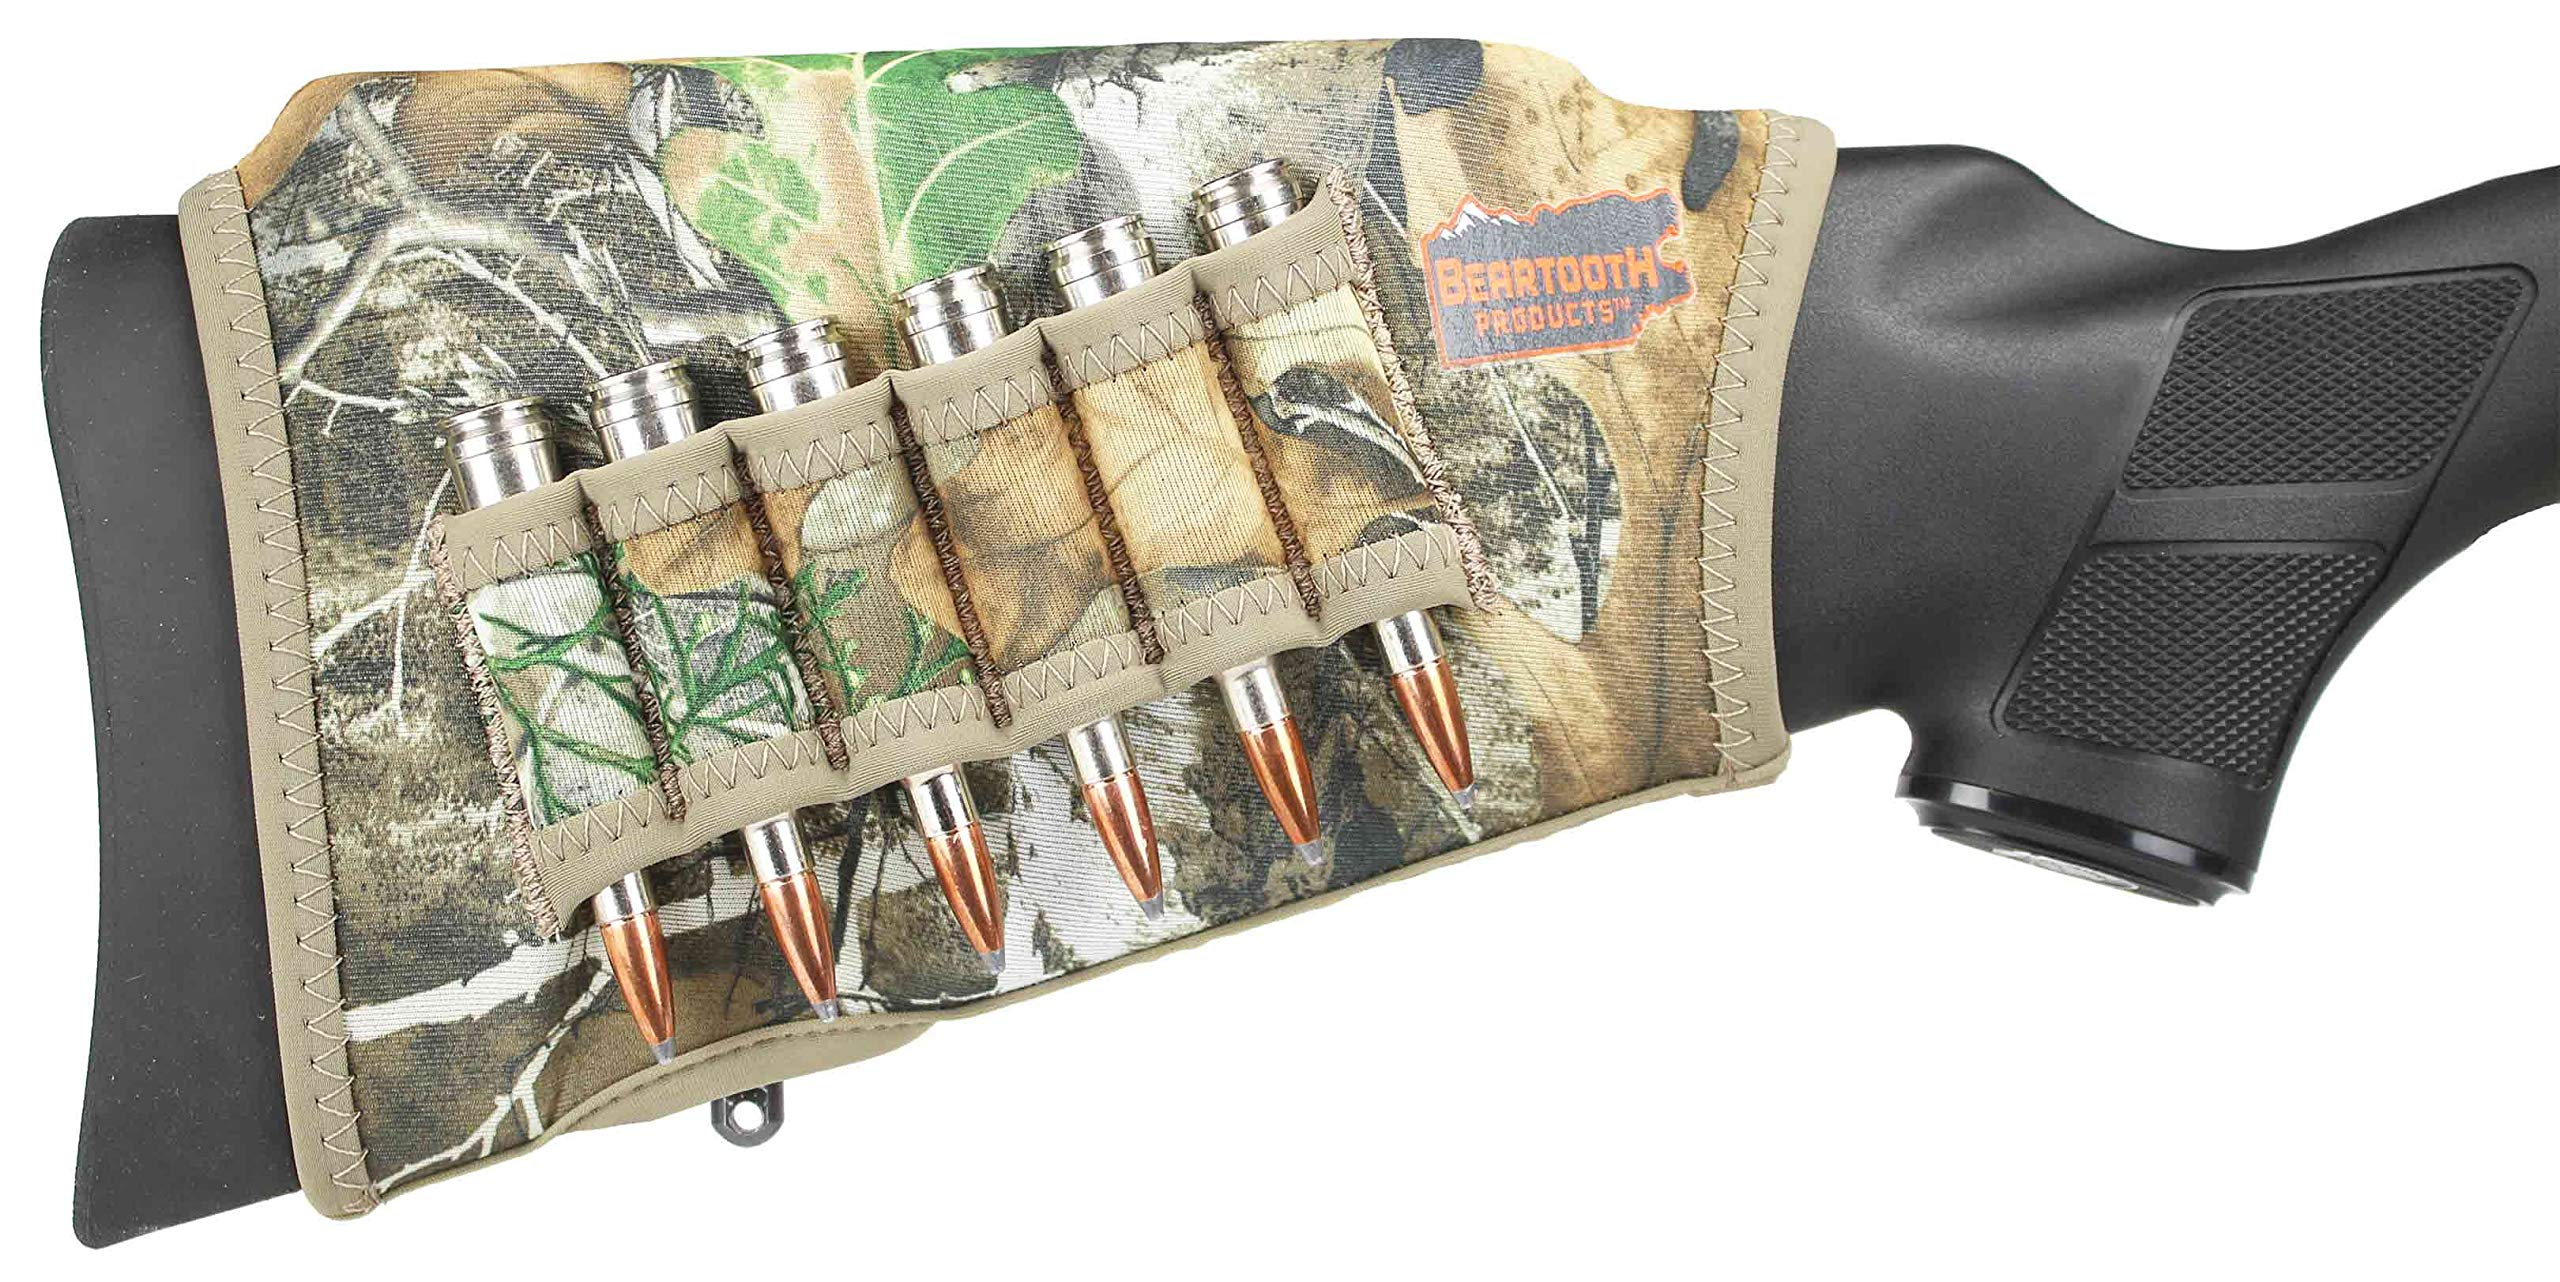 Beartooth Comb Raising Kit 2.0 - Neoprene Gun Stock Sleeve + (5) Hi-Density Foam Inserts - Rifle Model (Realtree Edge) by Beartooth Products